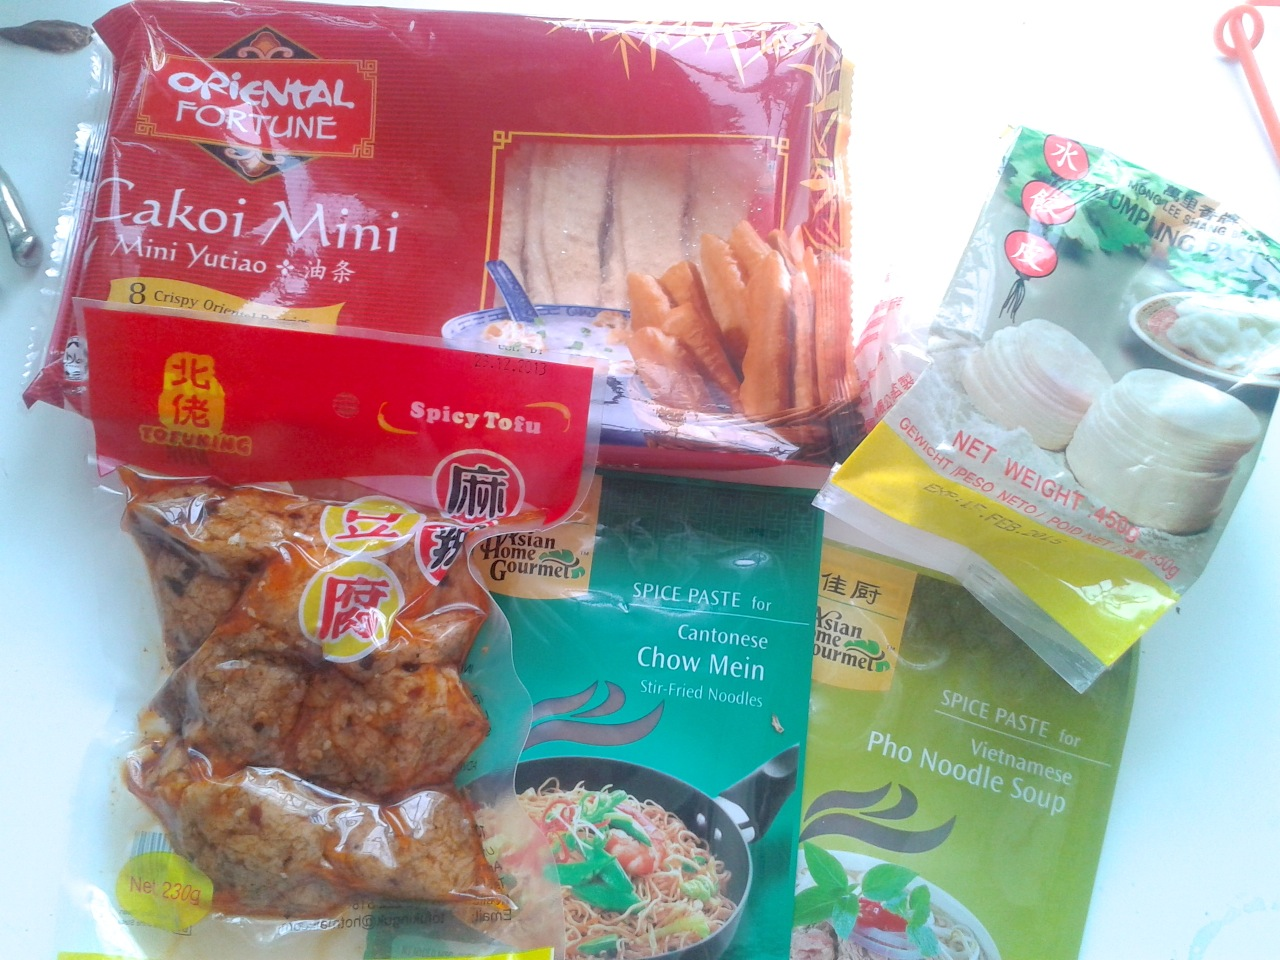 http://fatgayvegan.com/wp-content/uploads/2013/12/groceries.jpg